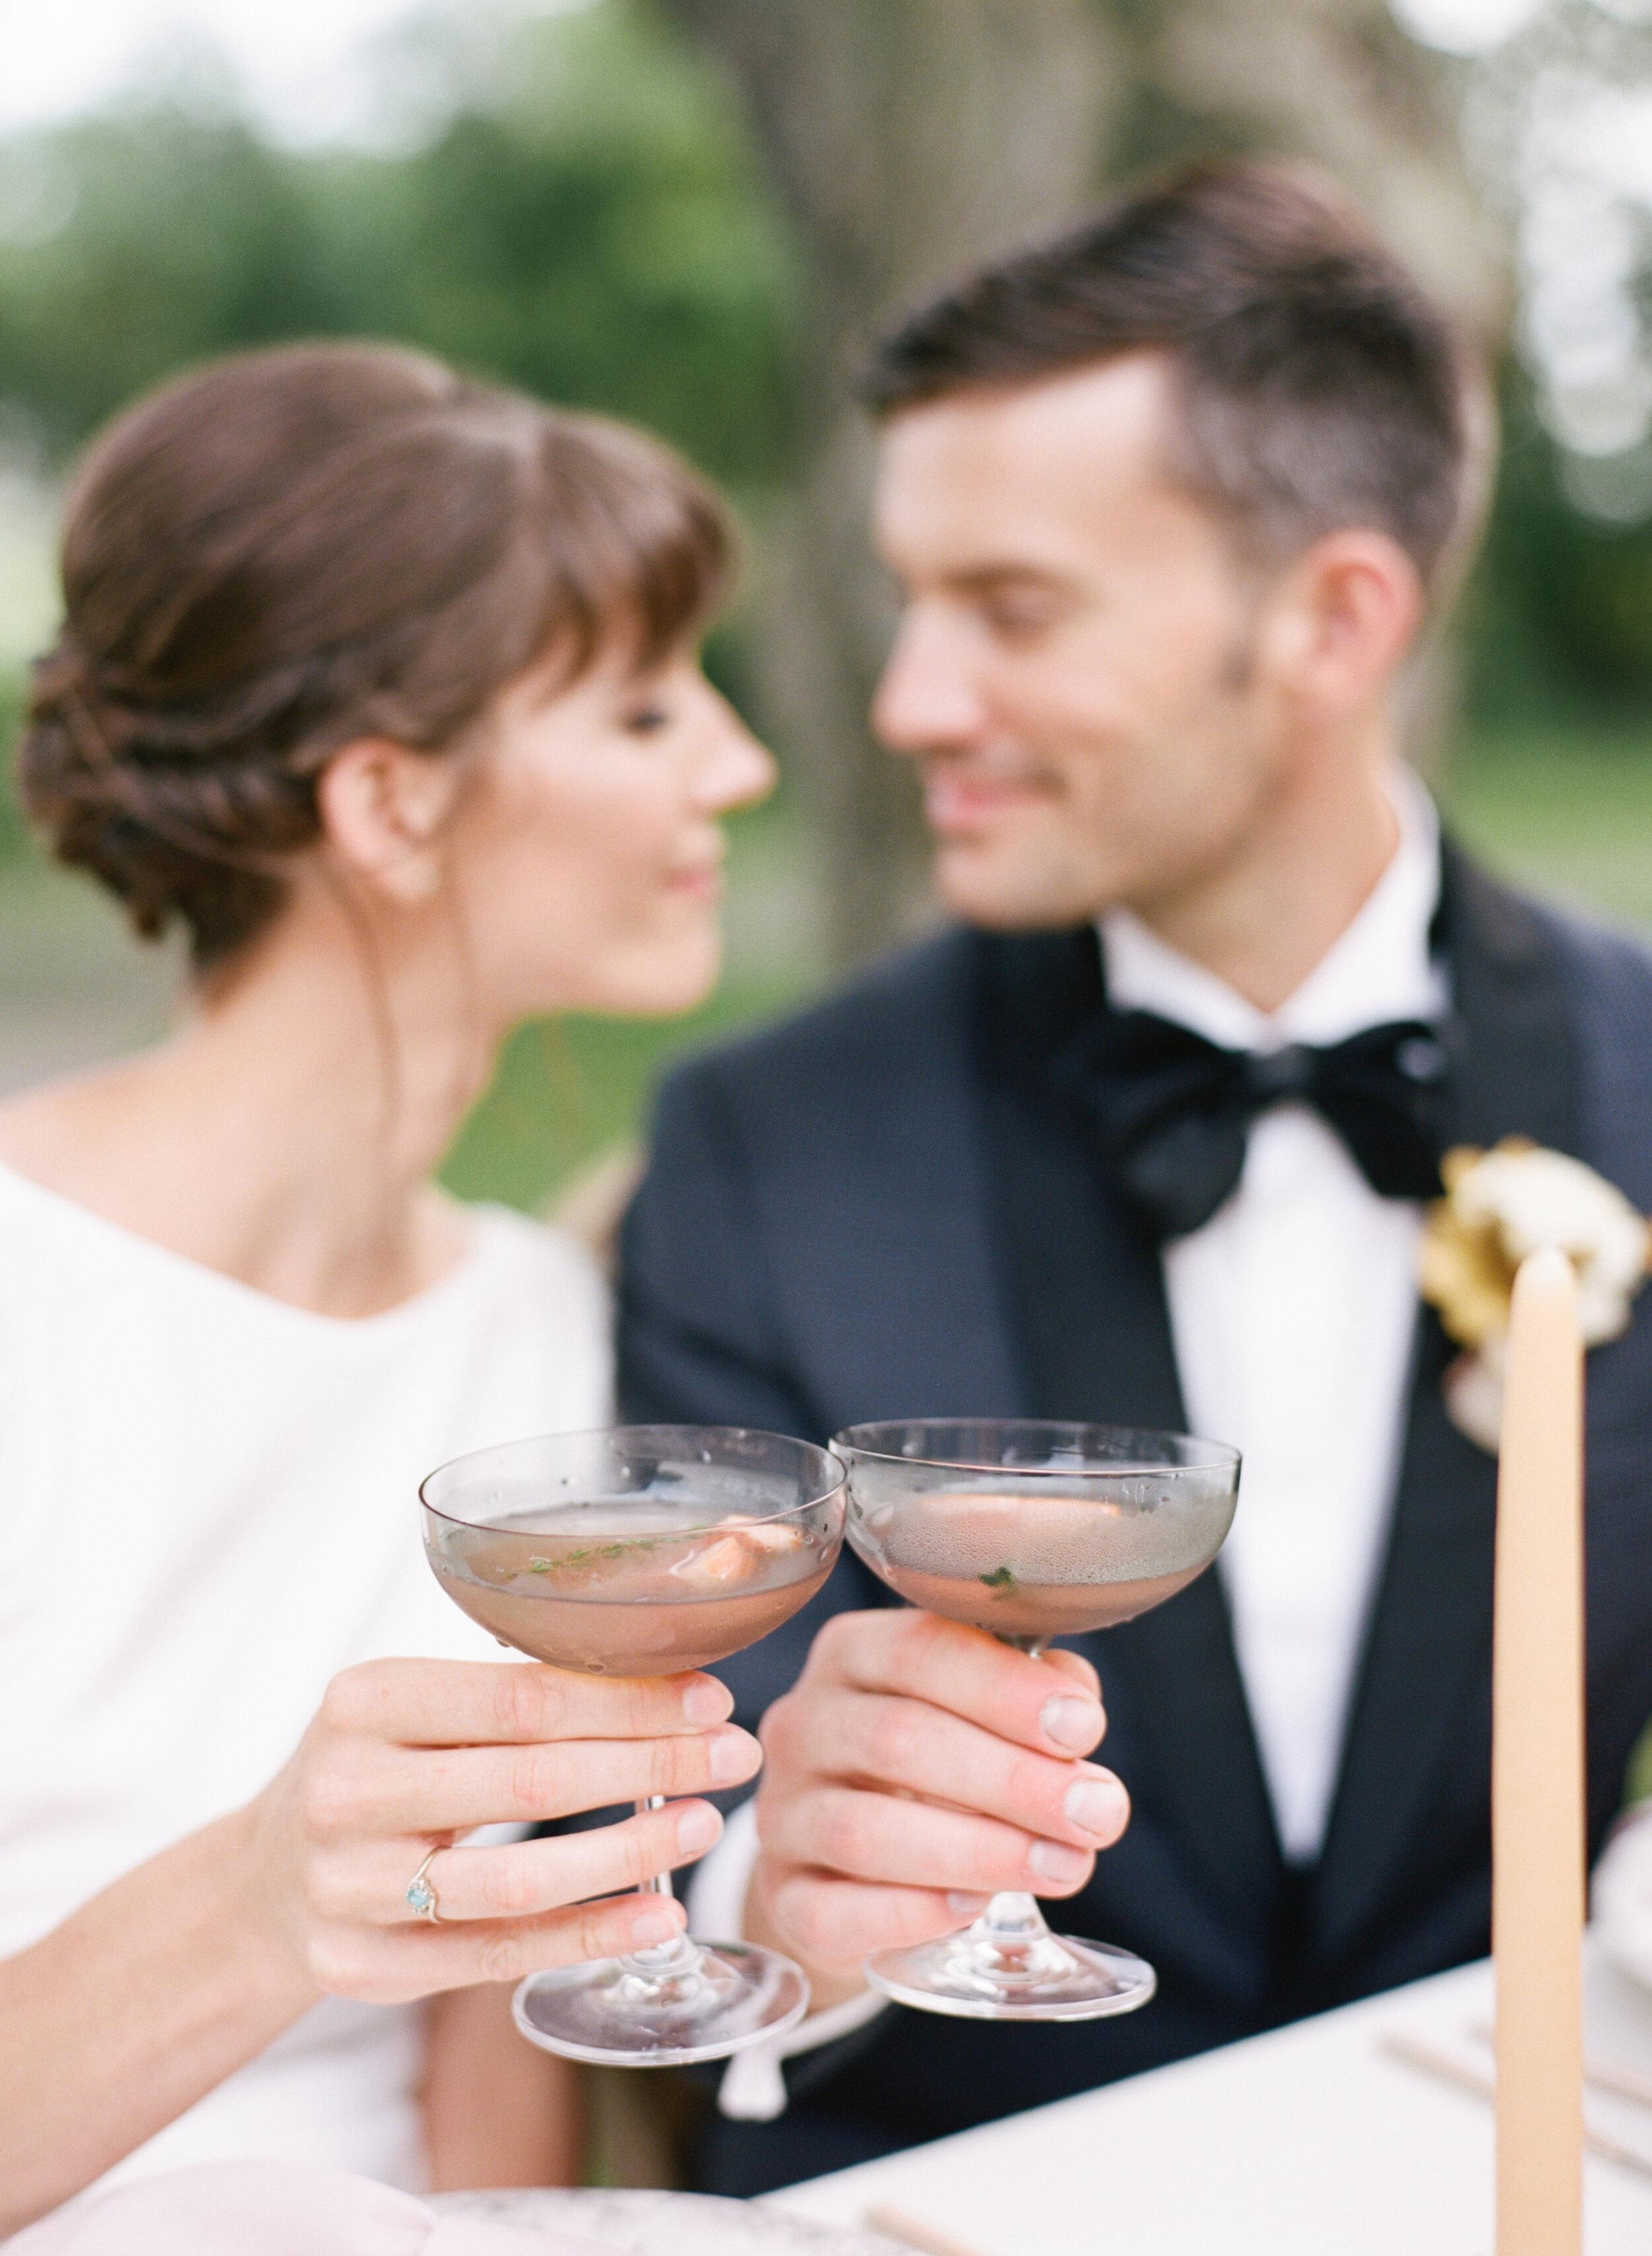 alexandra-meseke-understated-soft-luxury-wedding-upstate-ny_0101.jpg